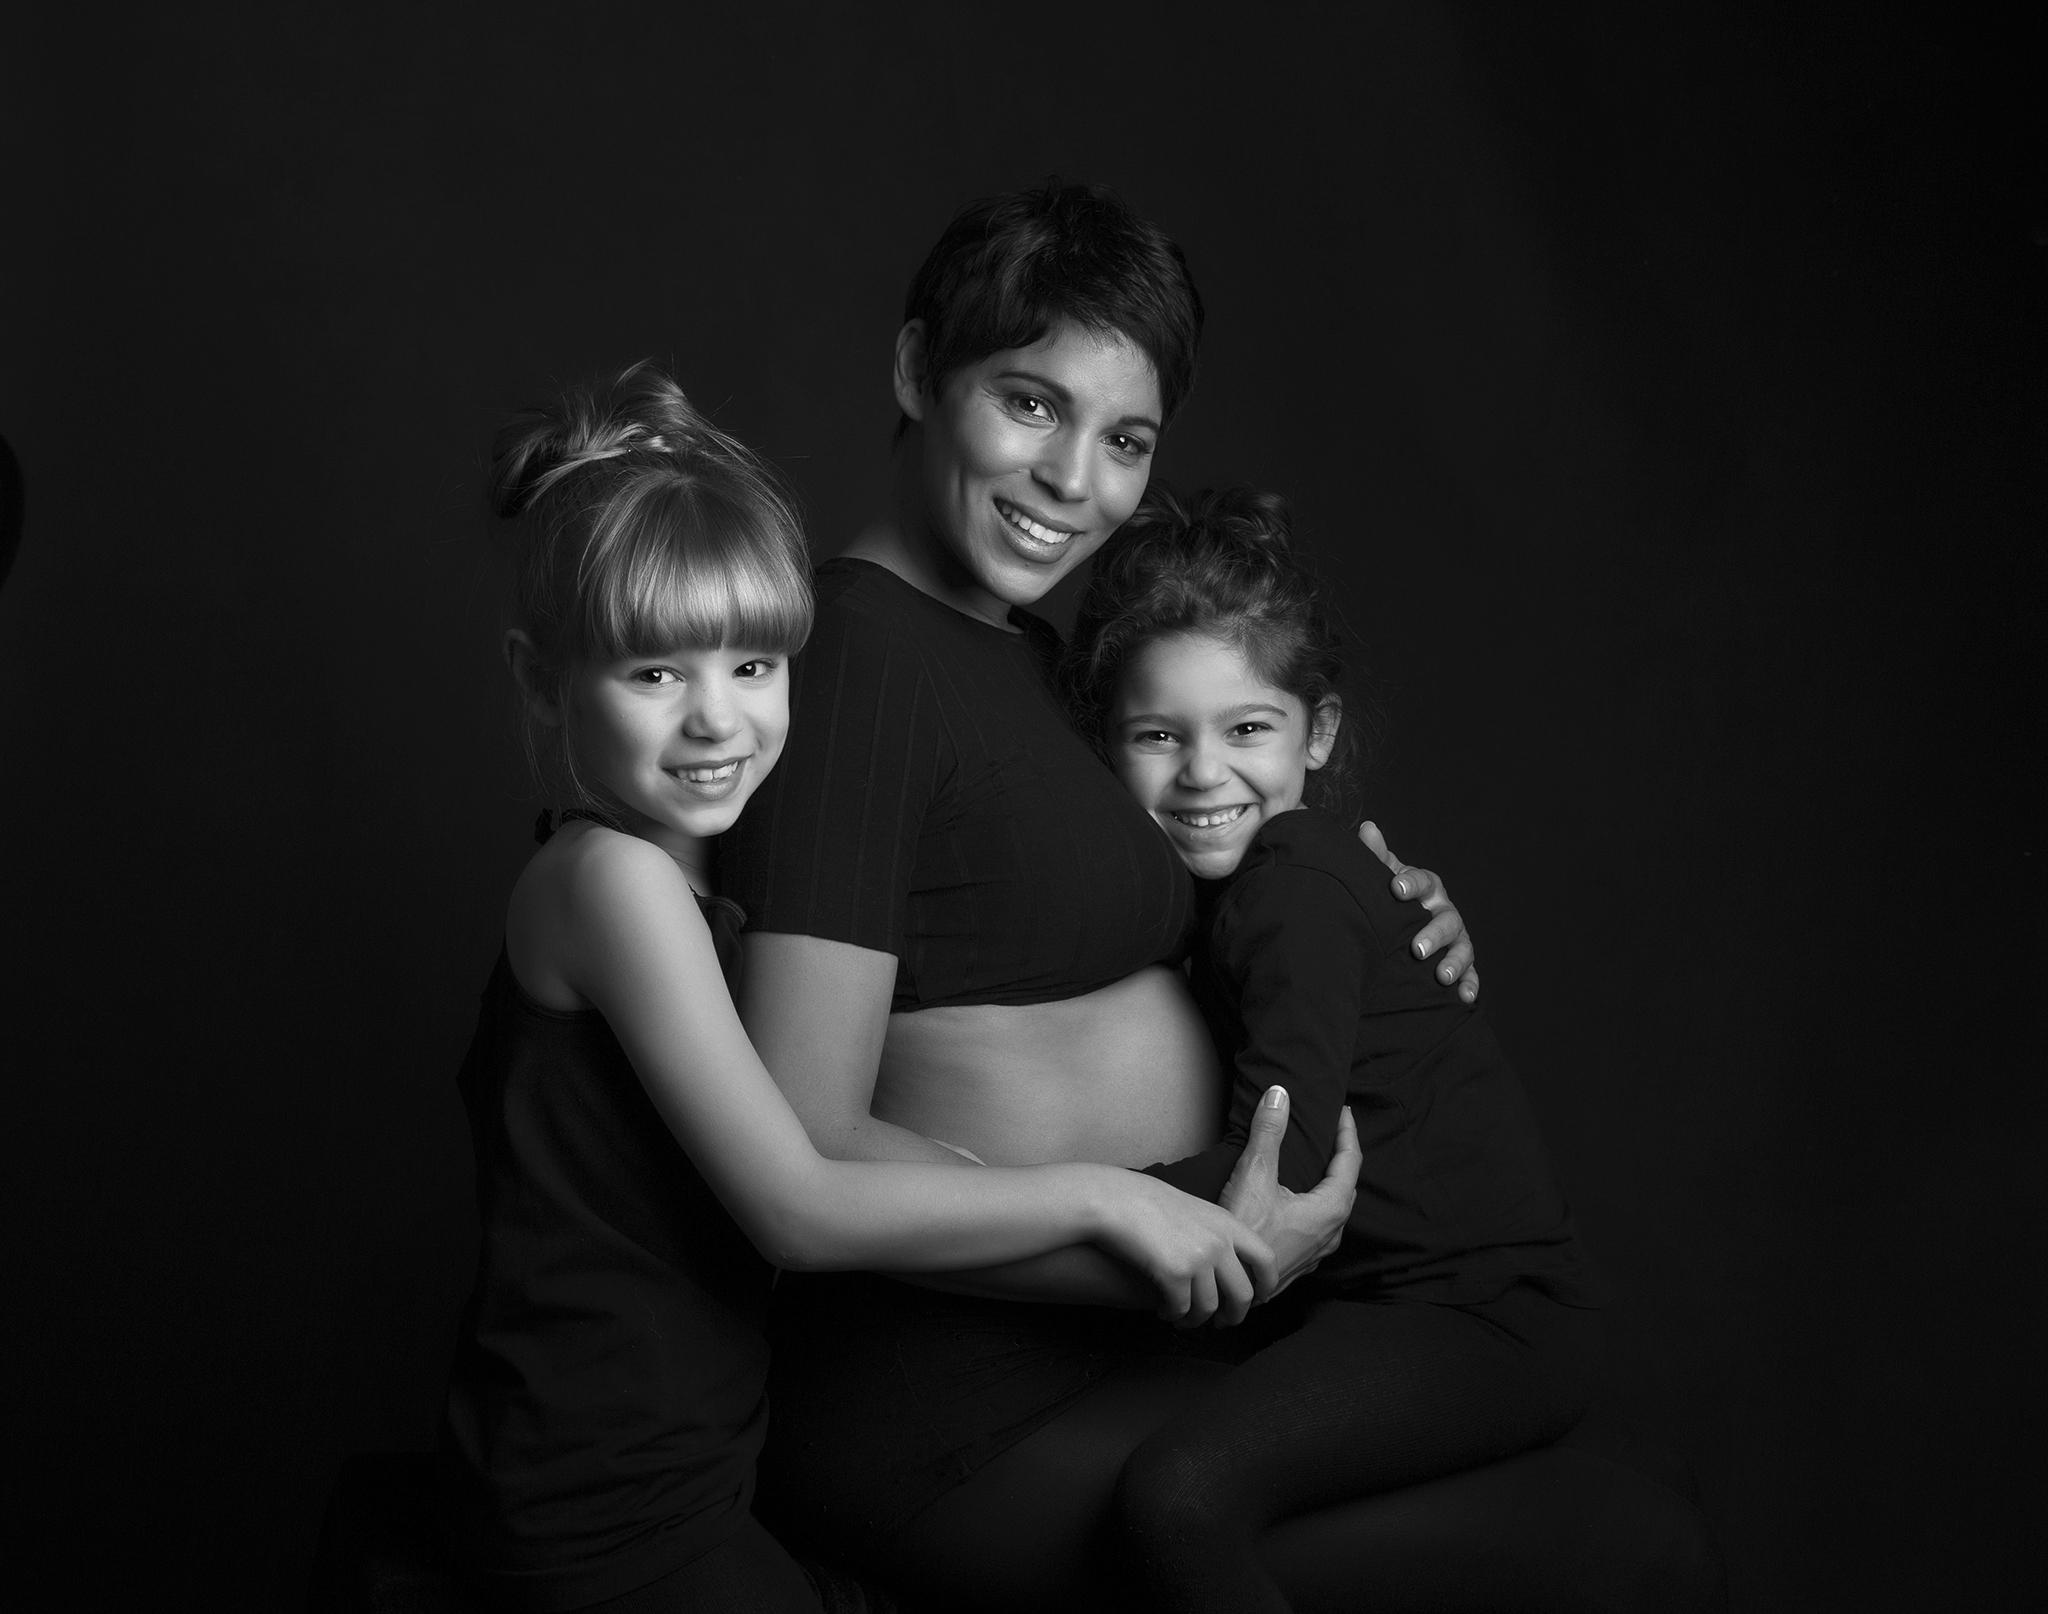 Elizabethg_fineart_photography_kingslangley_hertfordshire_family_maternity_pregnancy_baby_sampson_003.jpg